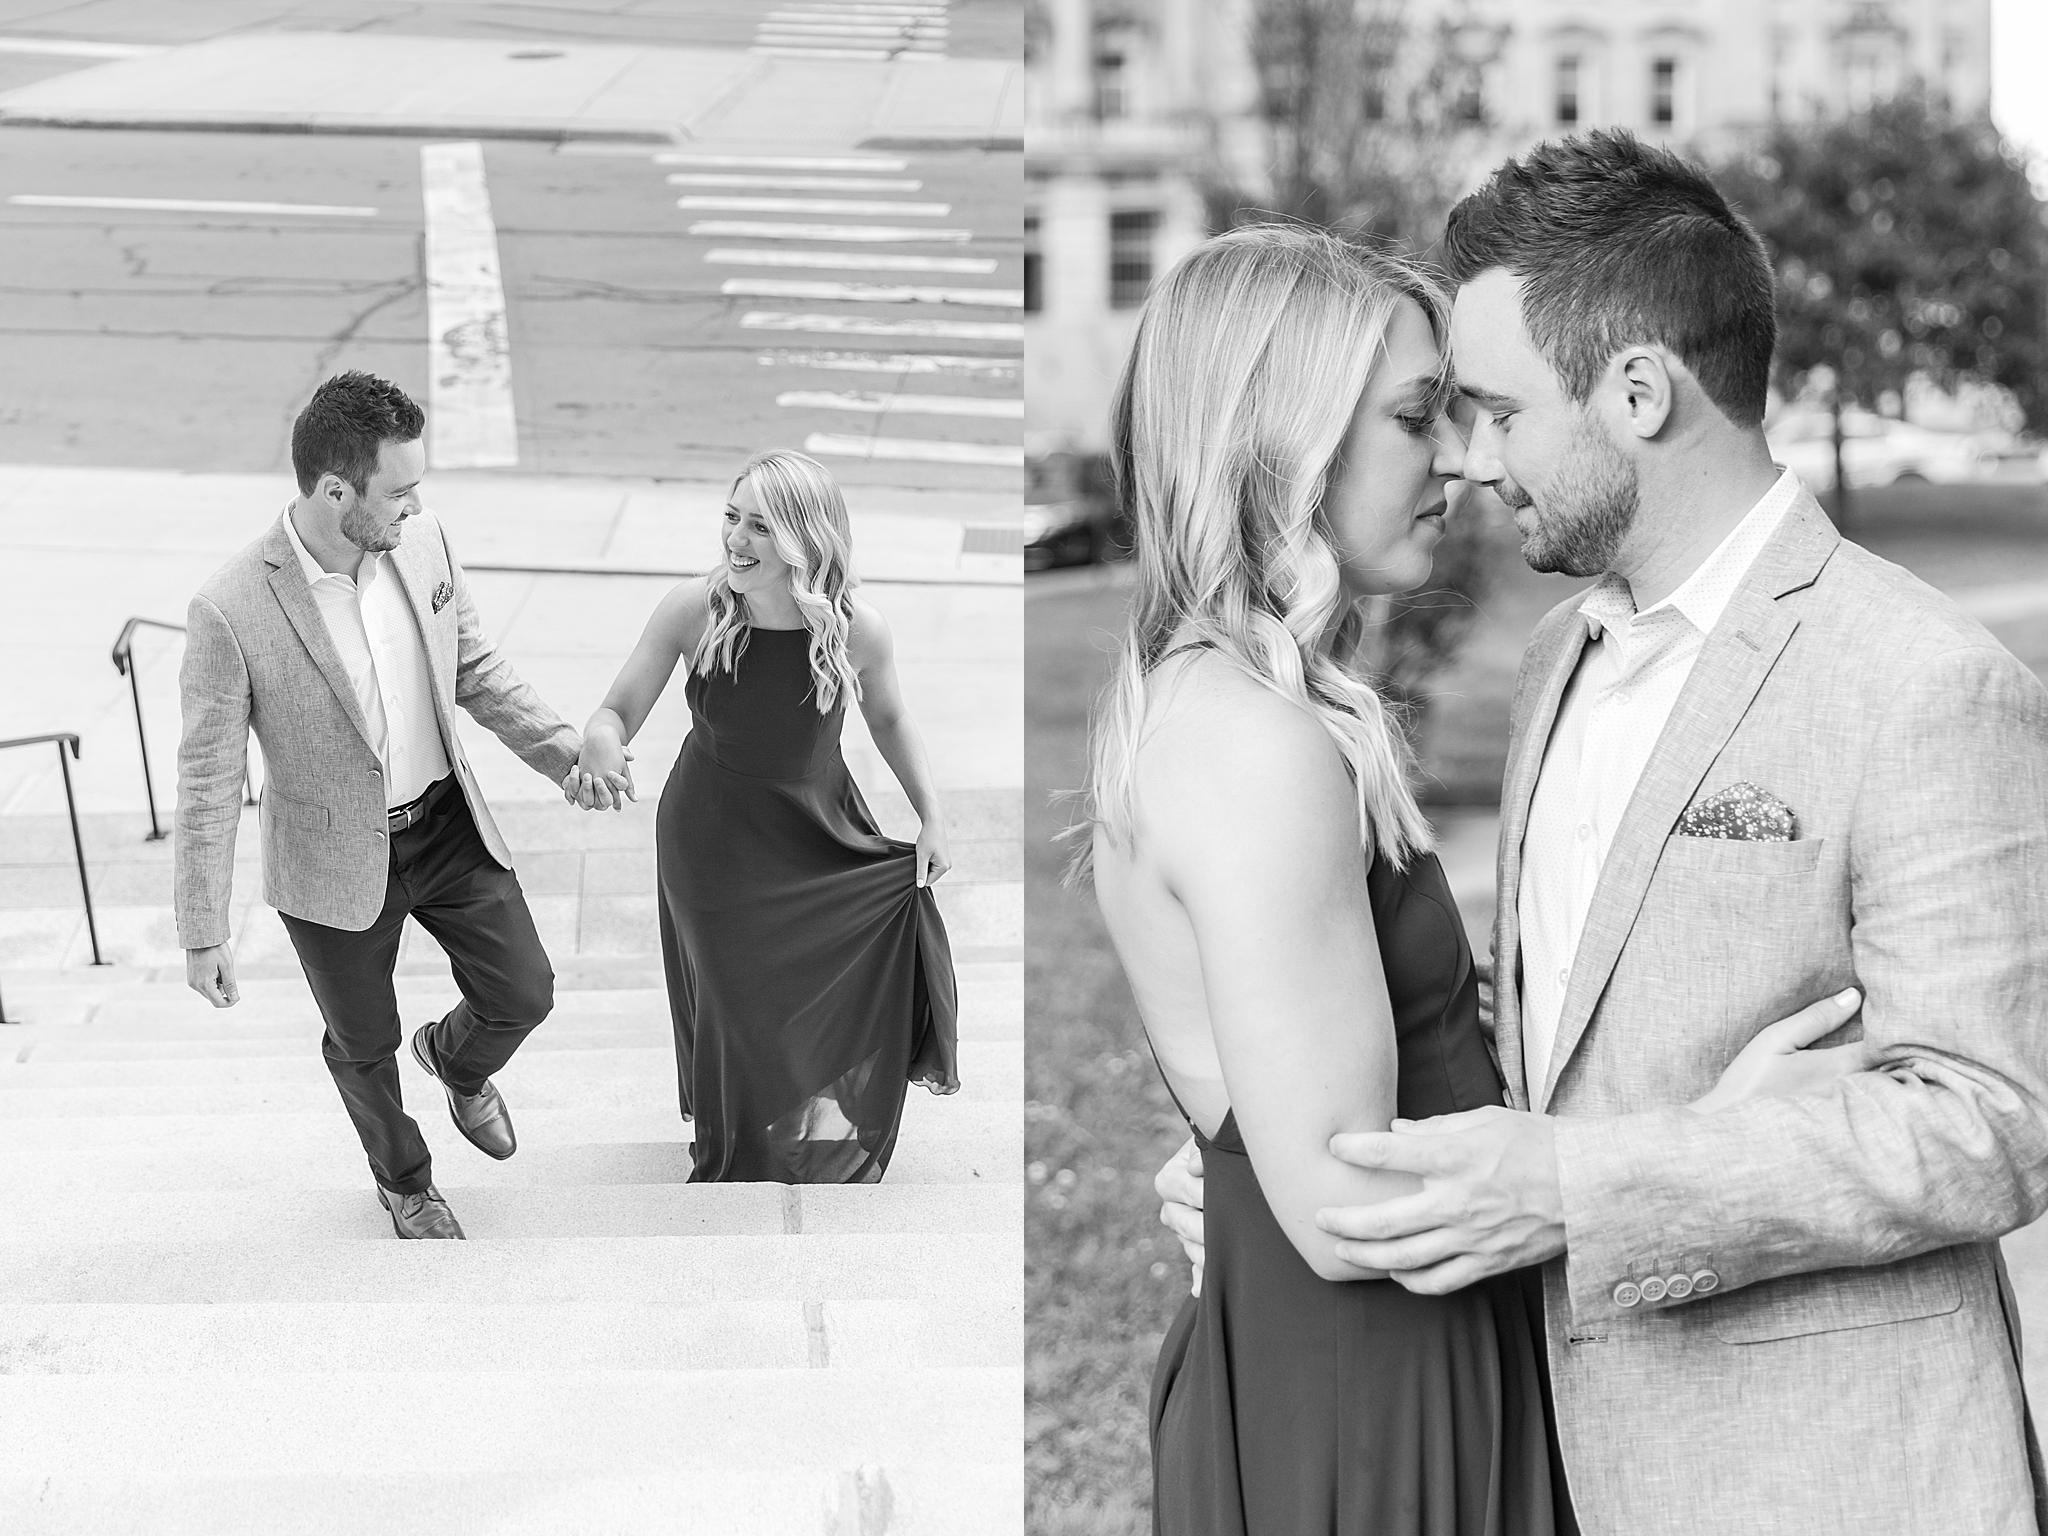 detroit-wedding-photographer-downtown-detroit-belle-isle-engagement-photos-sarah-eric-by-courtney-carolyn-photography_0027.jpg